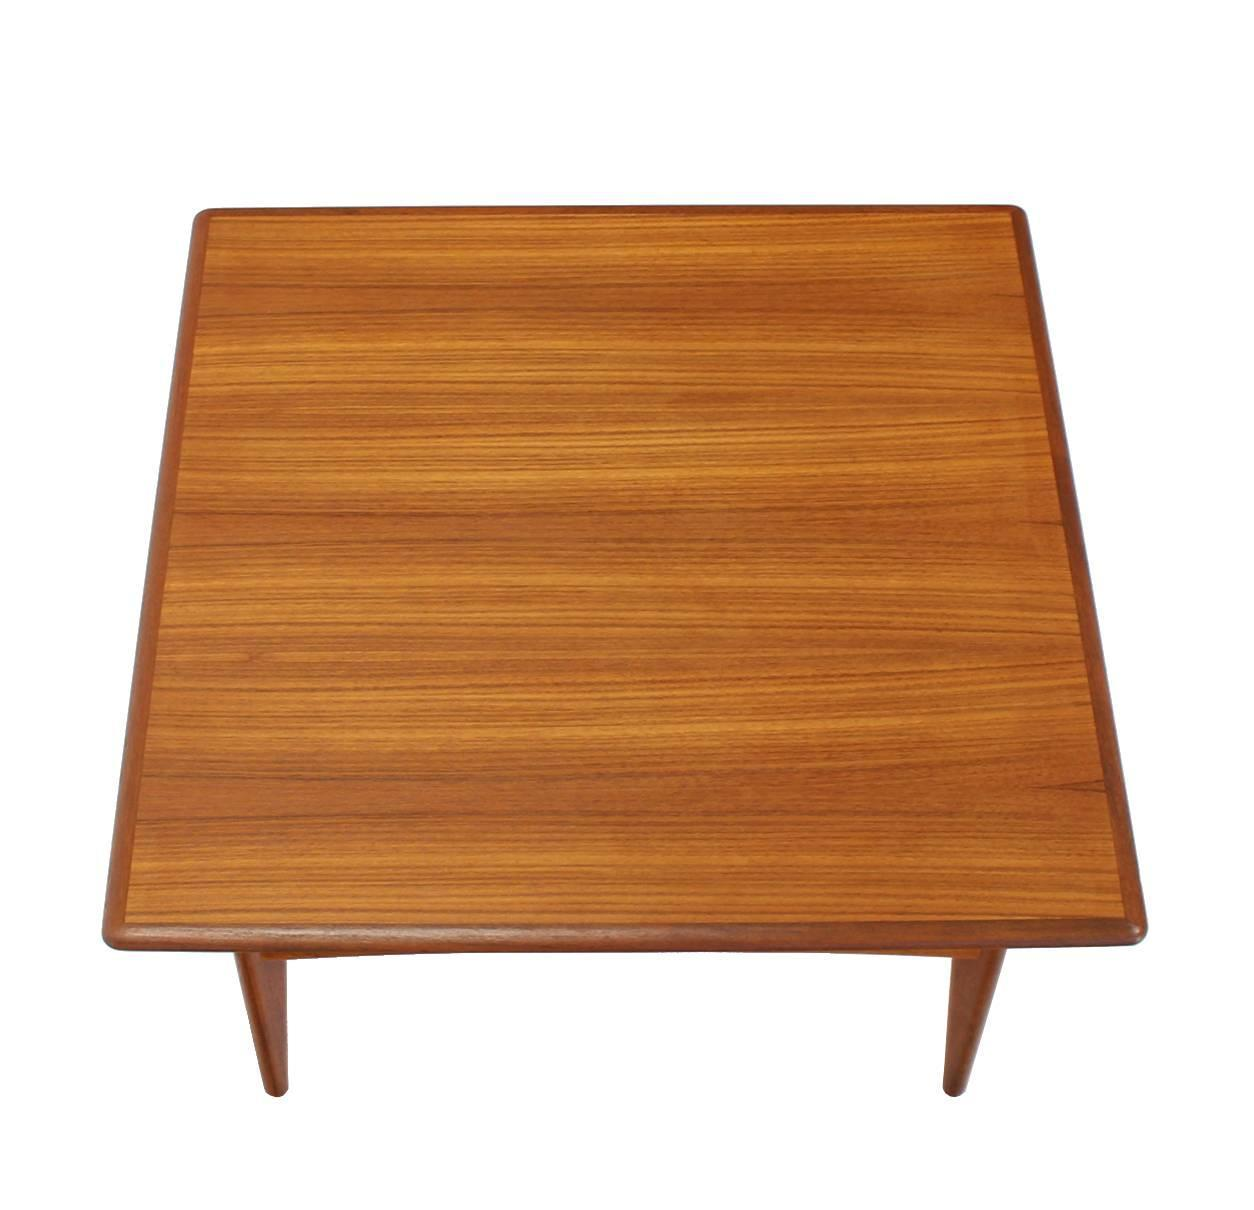 Danish Mid-Century Modern Teak Square Coffee Side Table